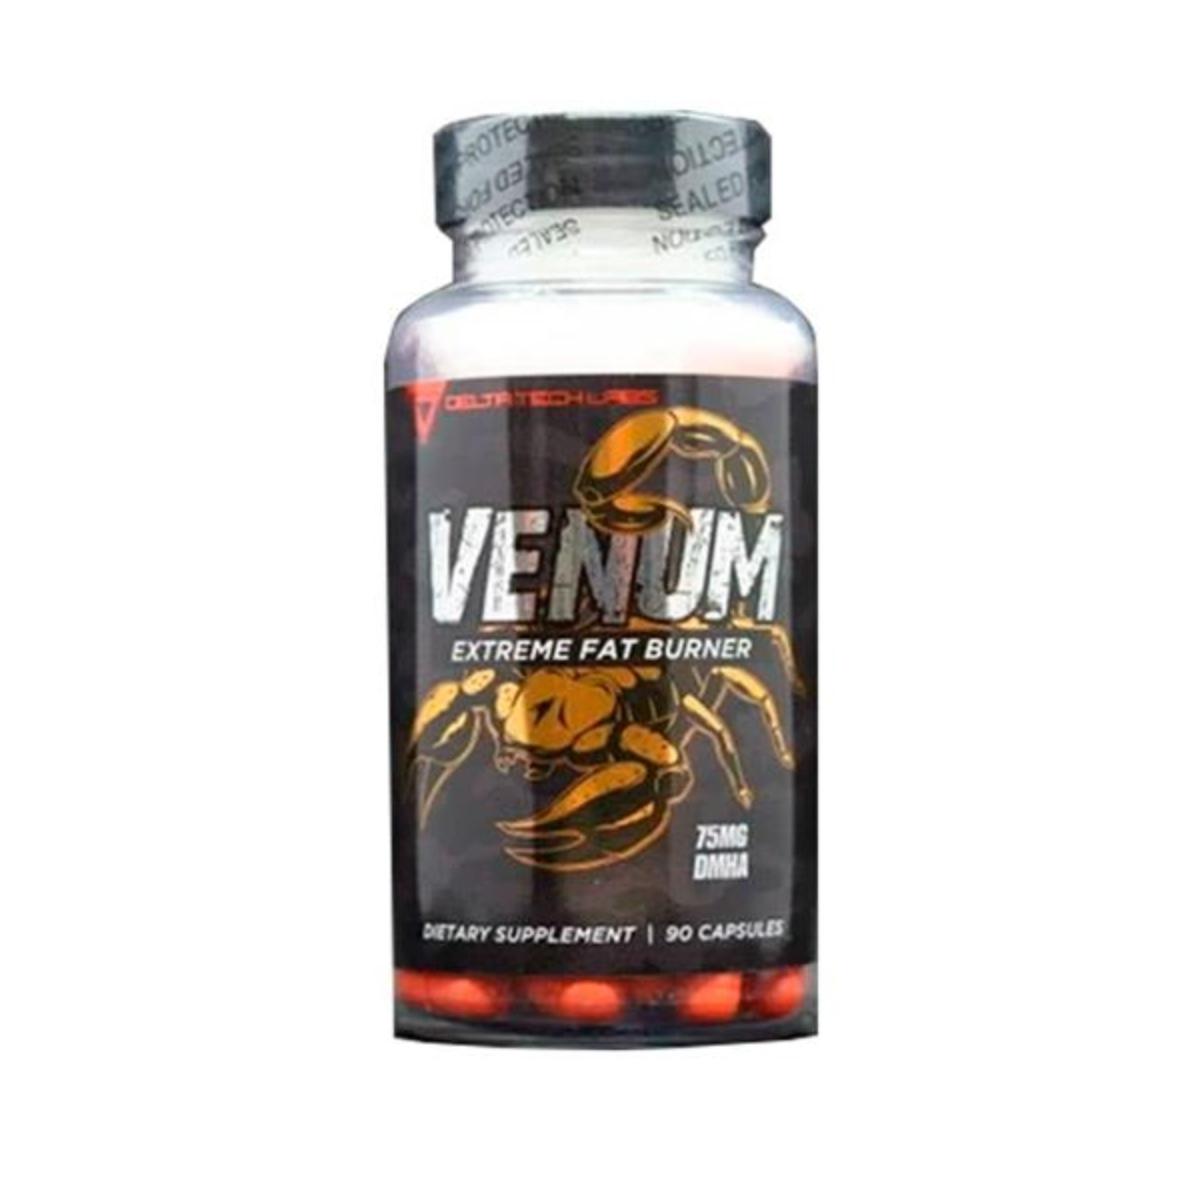 Termogênico Venum Extreme fat Burner 75mg DMHA 90Caps - Delta Tech Labs